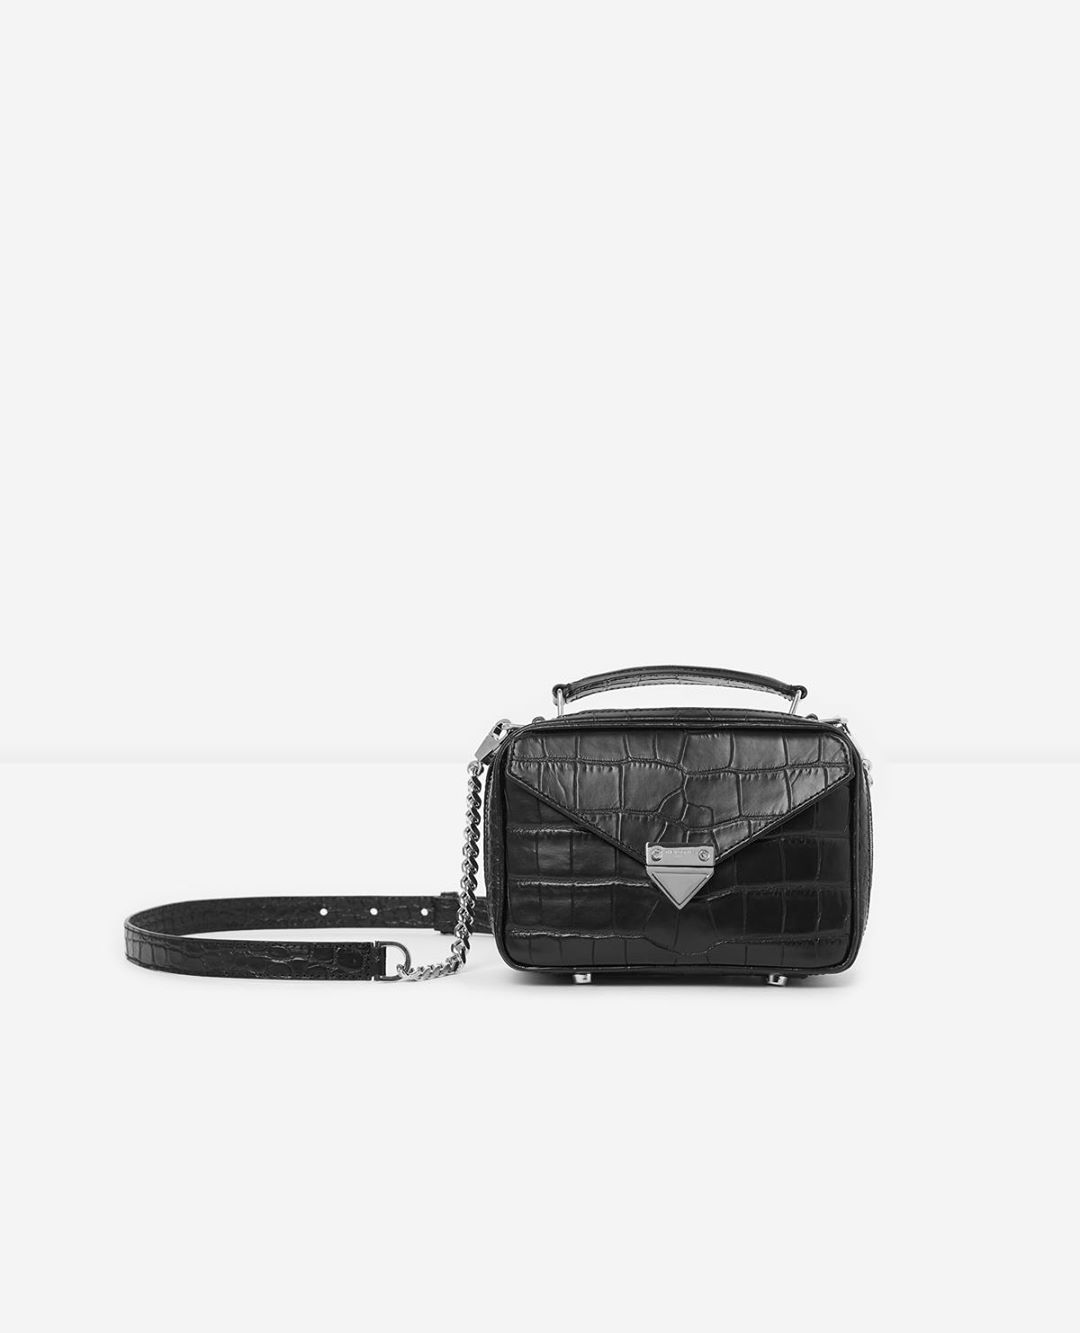 Mini black Barbara bag in crocodile leather